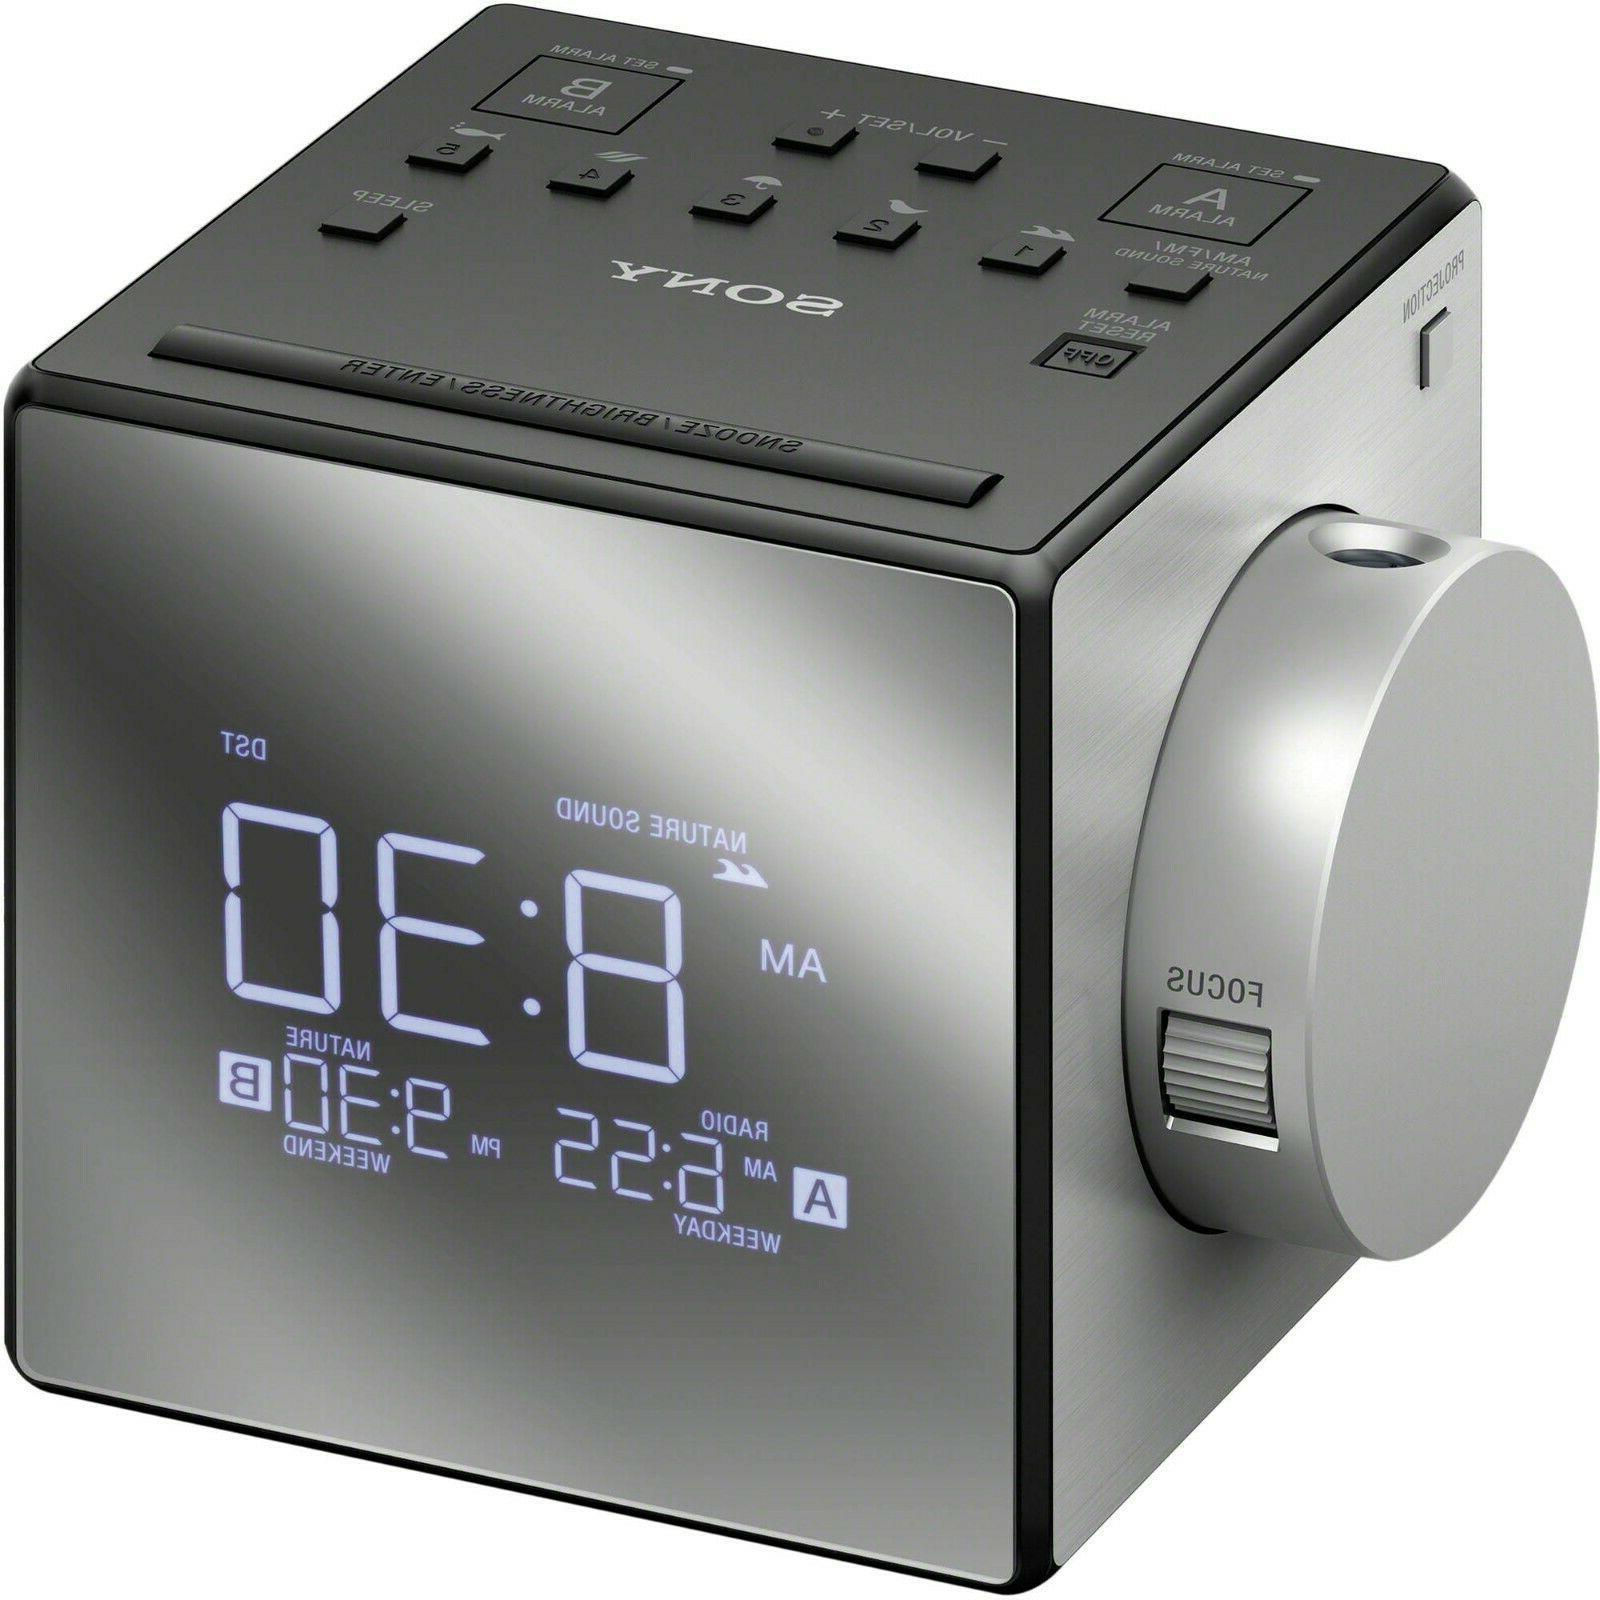 icfc1pj alarm clock radio